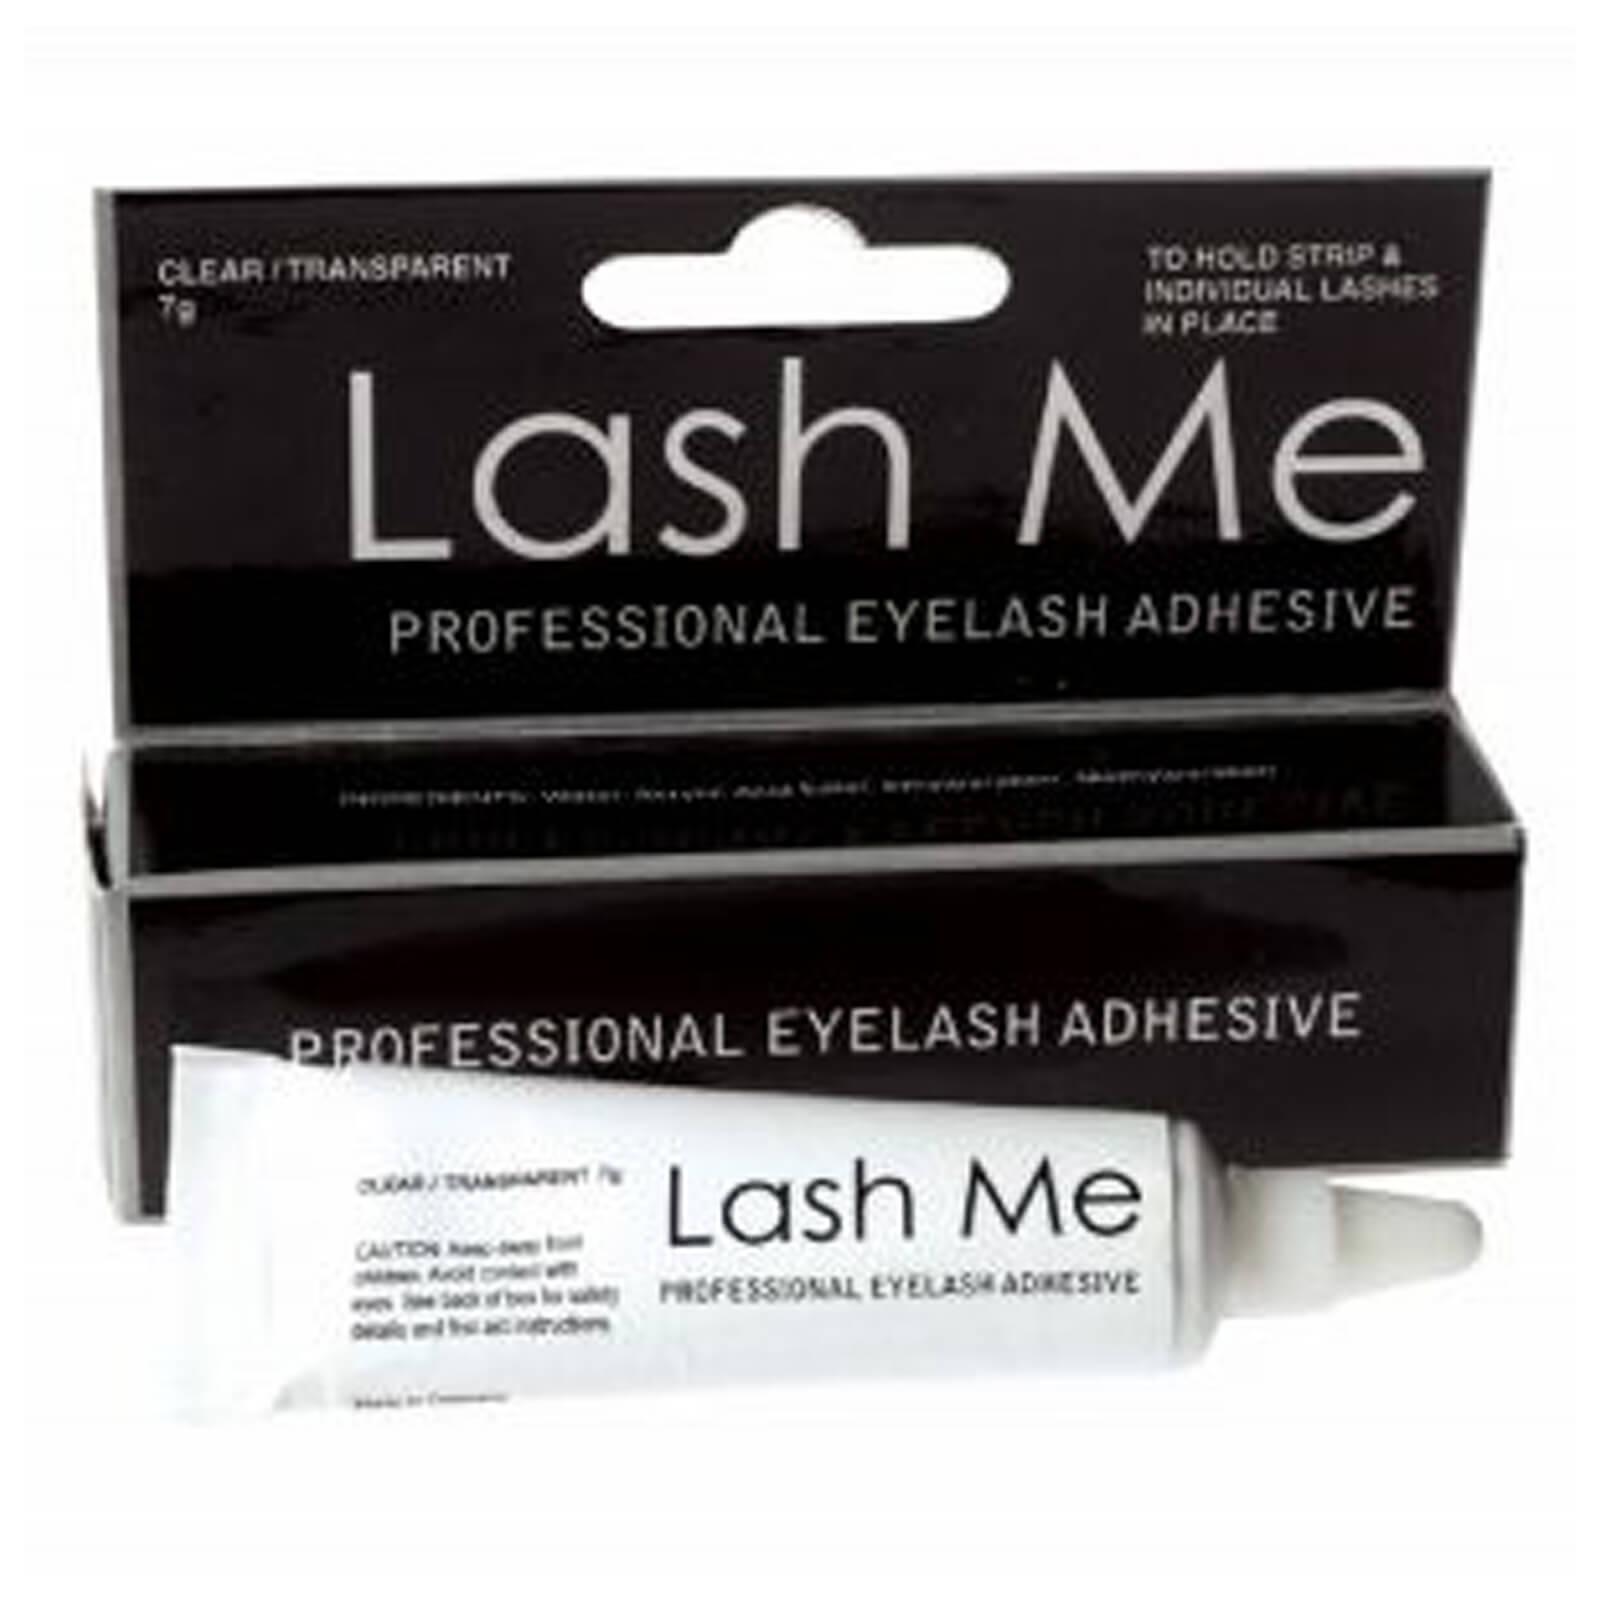 Lash Me Lashes Professional Eyelash Adhesive 7g Buy Online At Ry